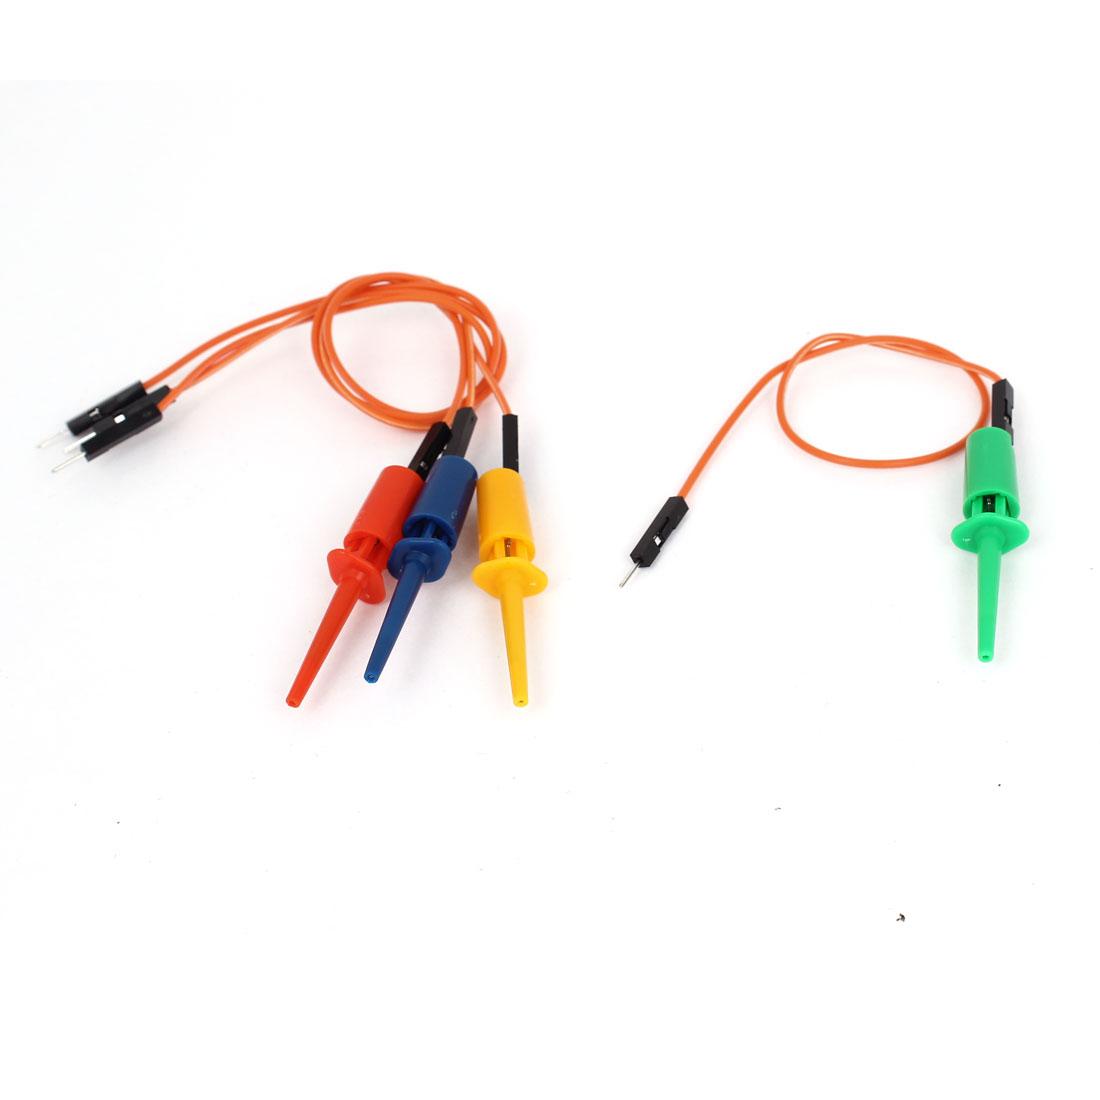 4 Pcs Grabber Test Probe Single Hook Clip Cable Set Assorted Color